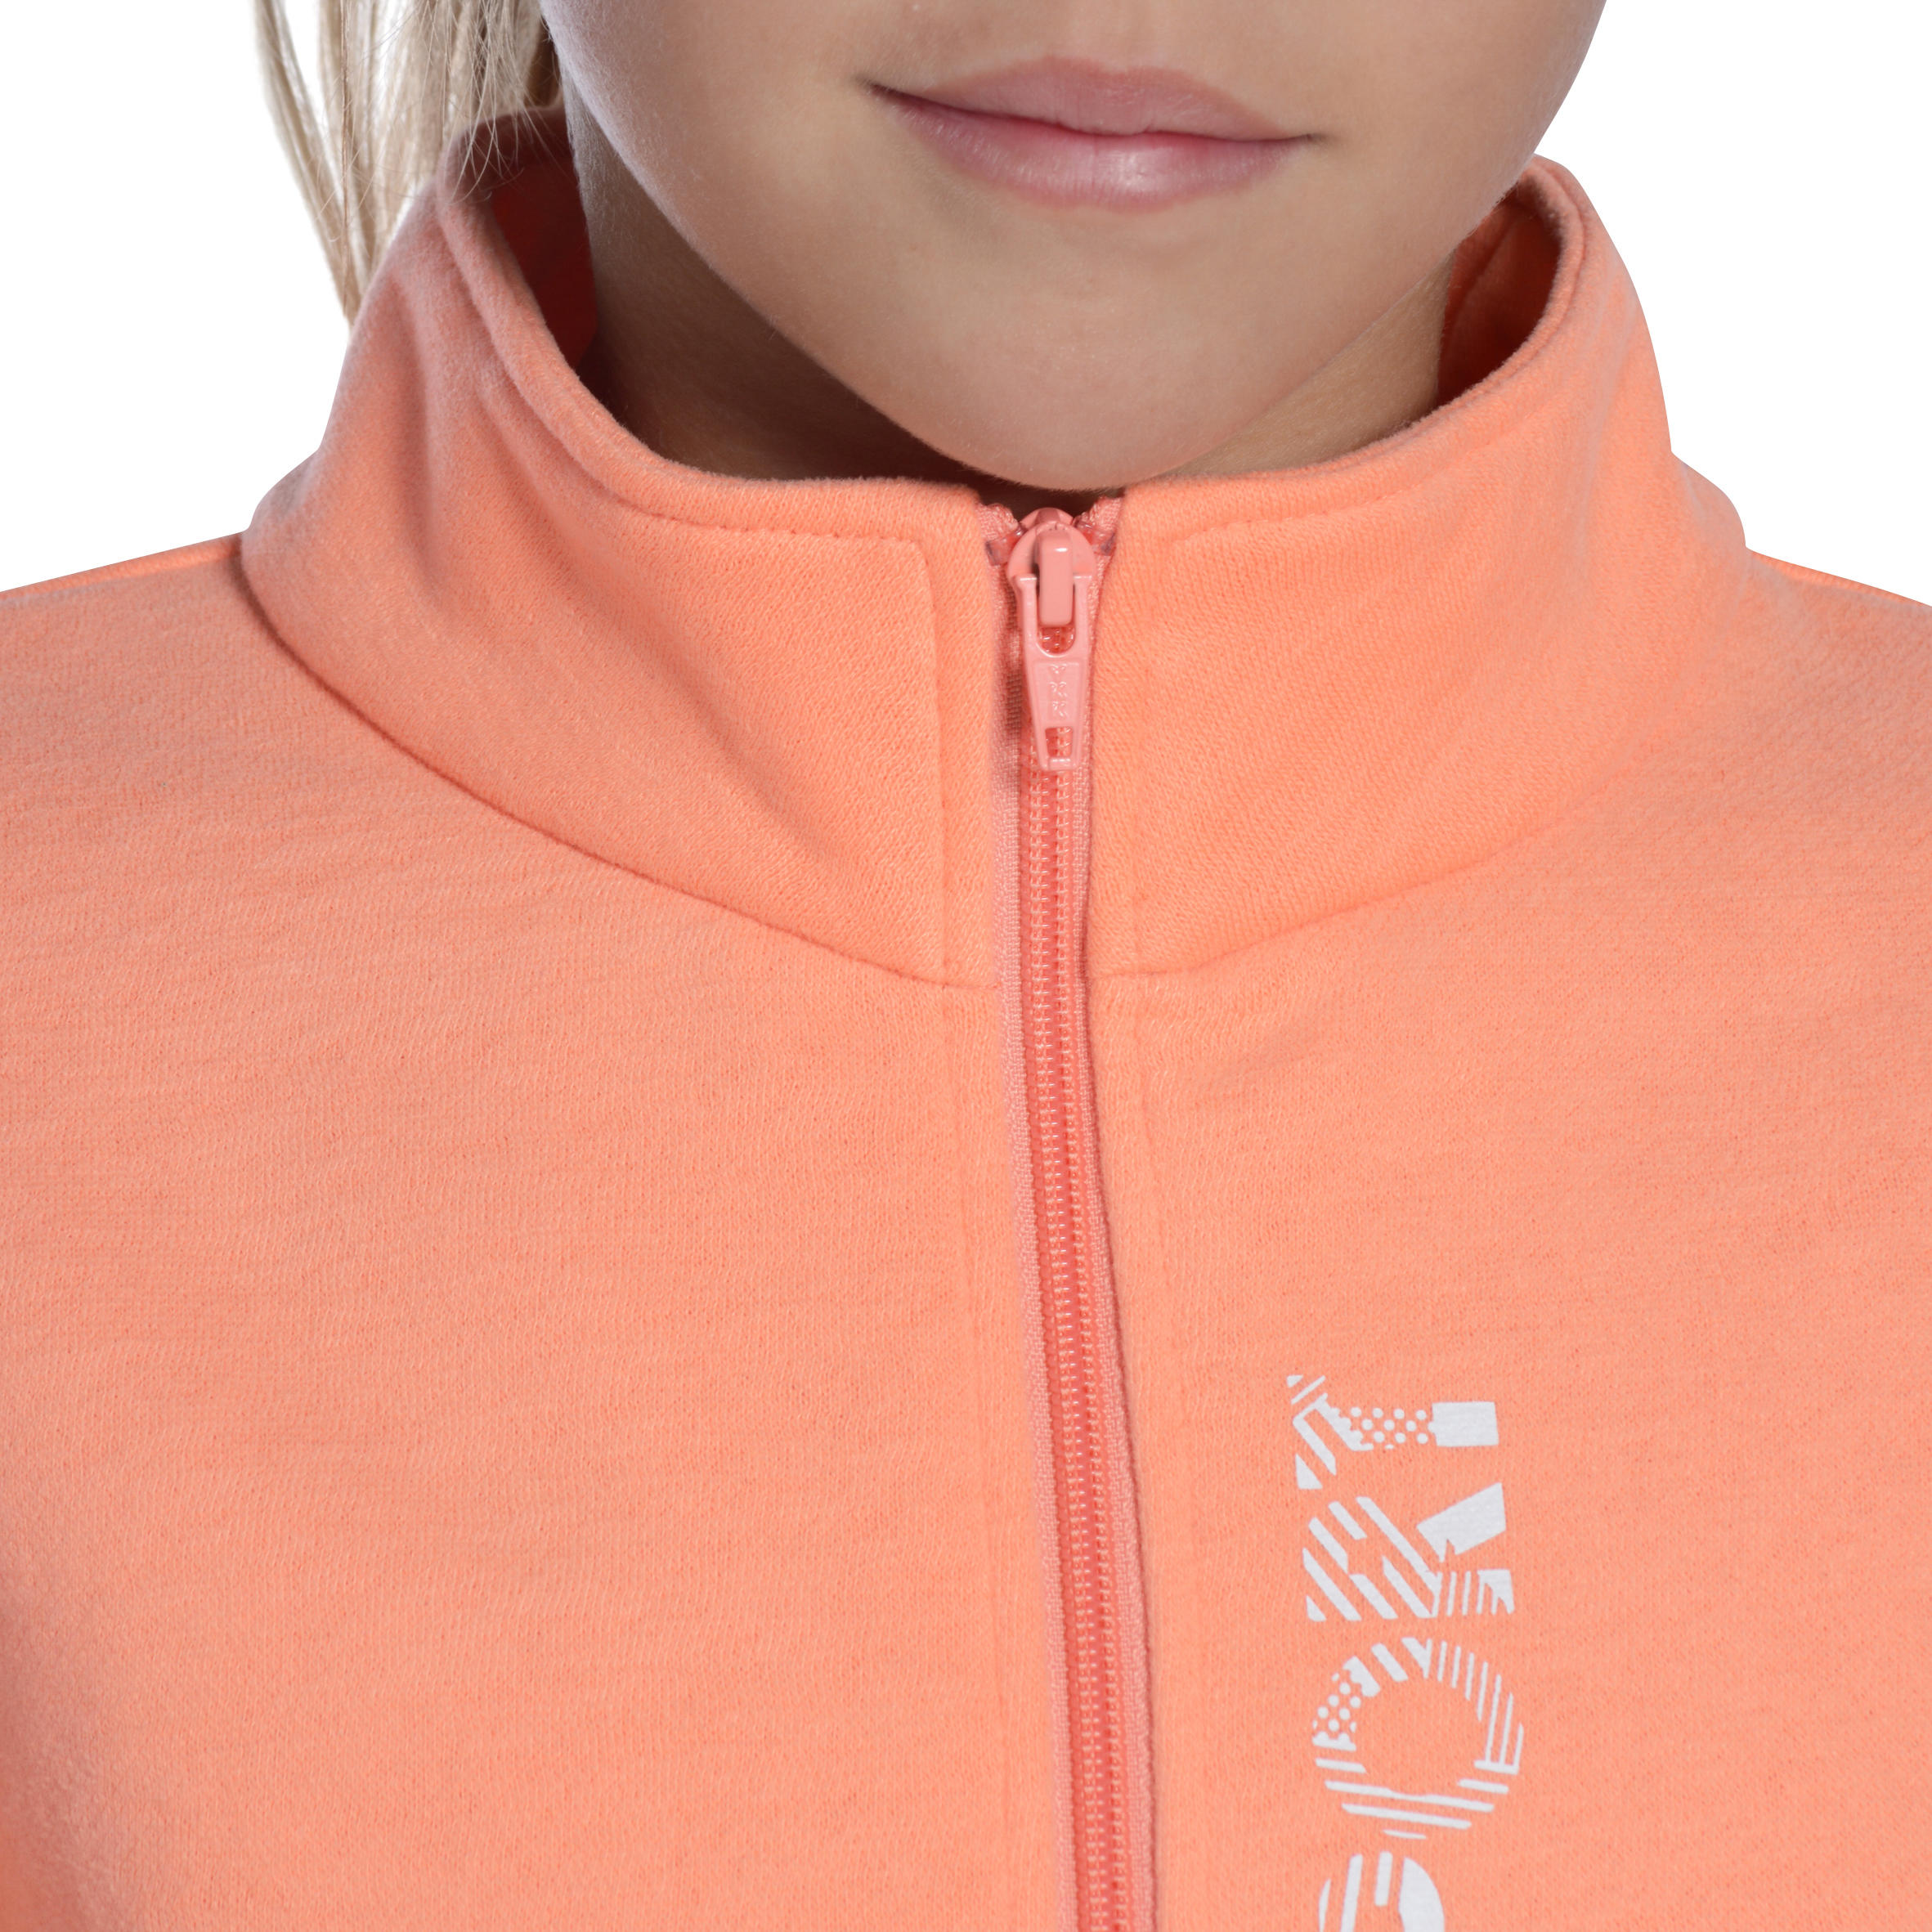 Warm'y Girls' Warm Zip-Up Gym Tracksuit - Pink Print